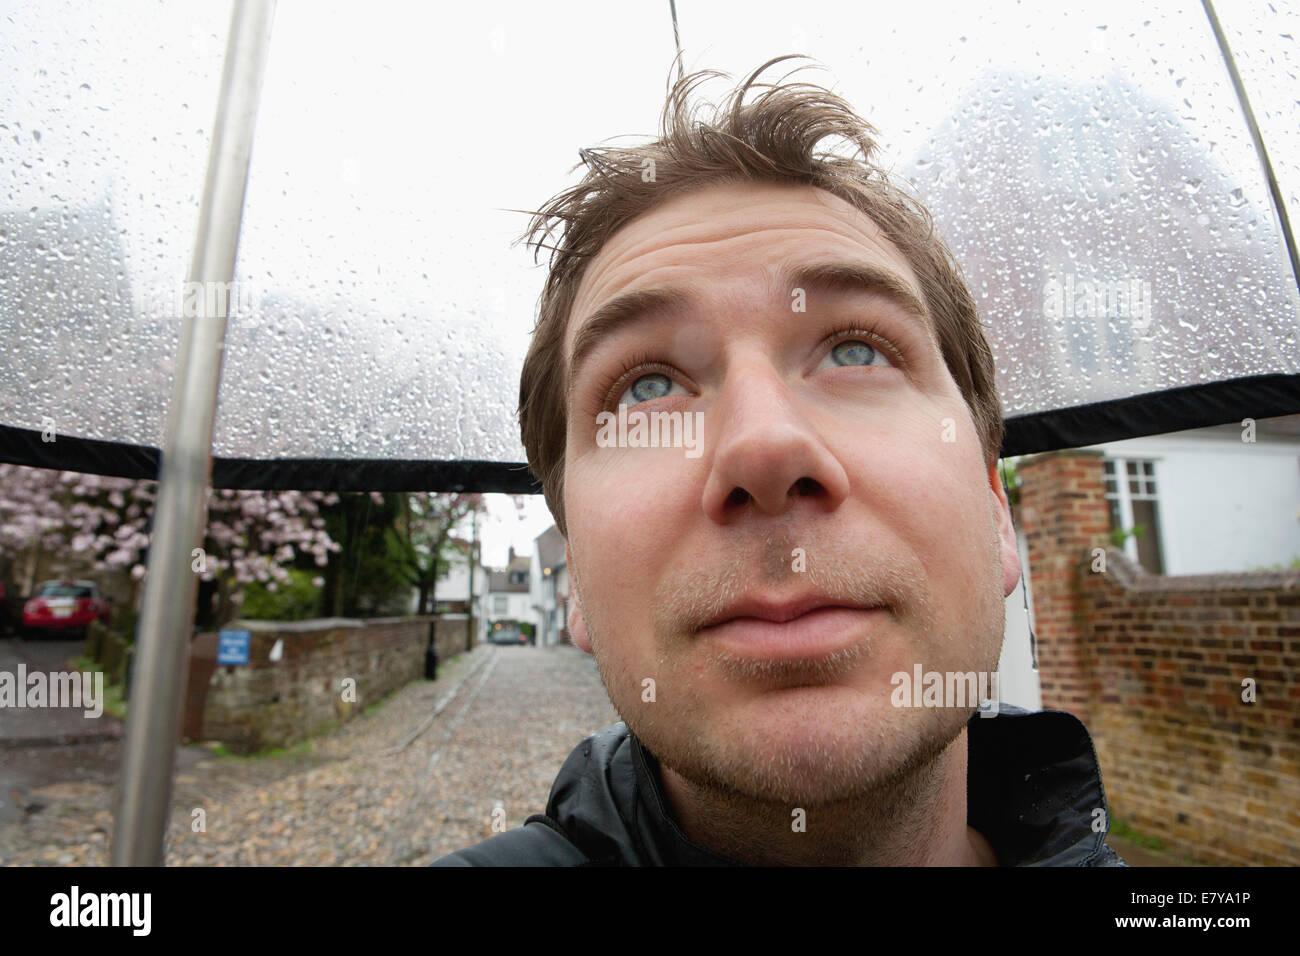 MAN SHELTERING UNDER UMBRELLA - Stock Image